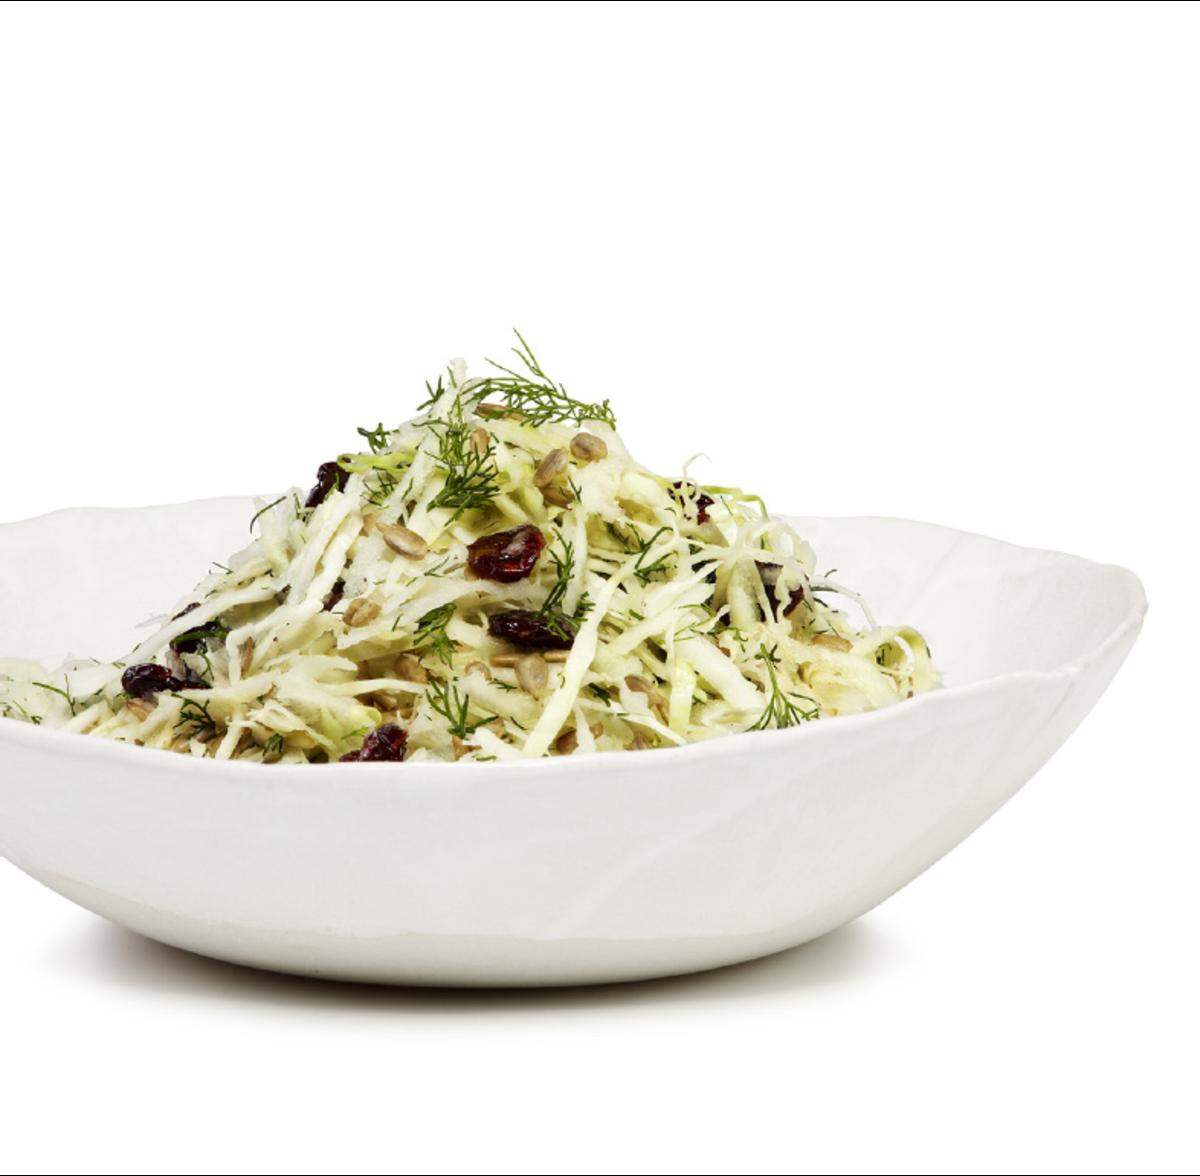 Kohlrabi and cabbage salad